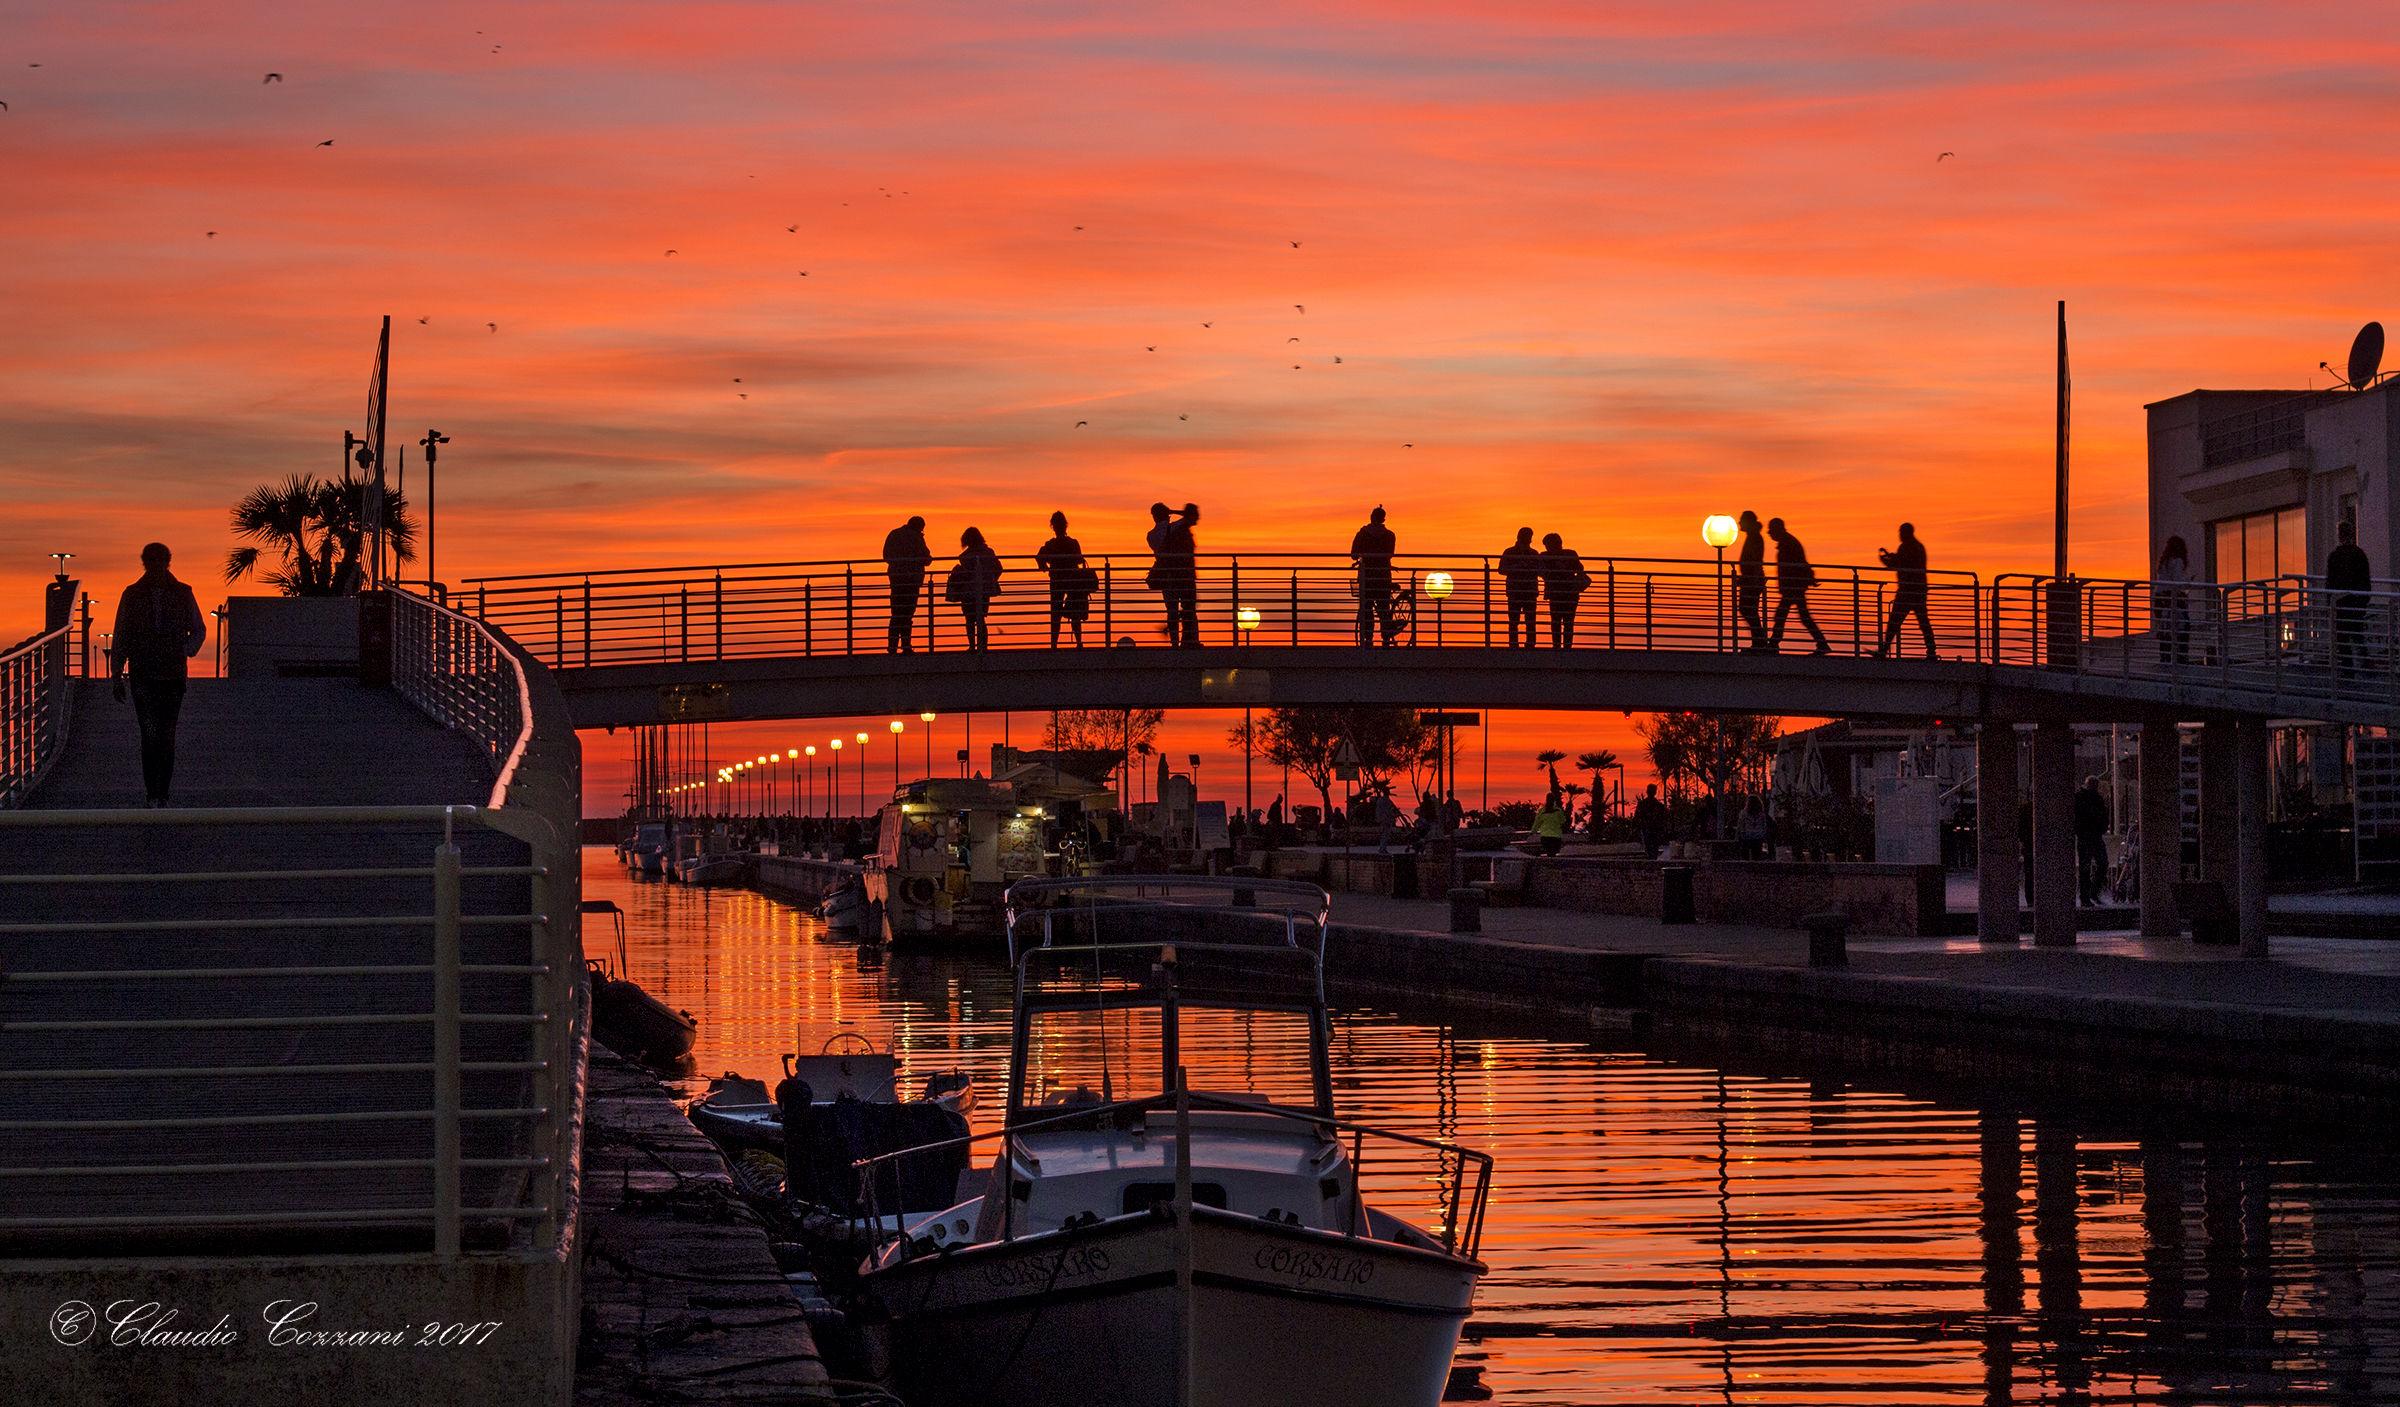 Sunset at dock in Viareggio two...